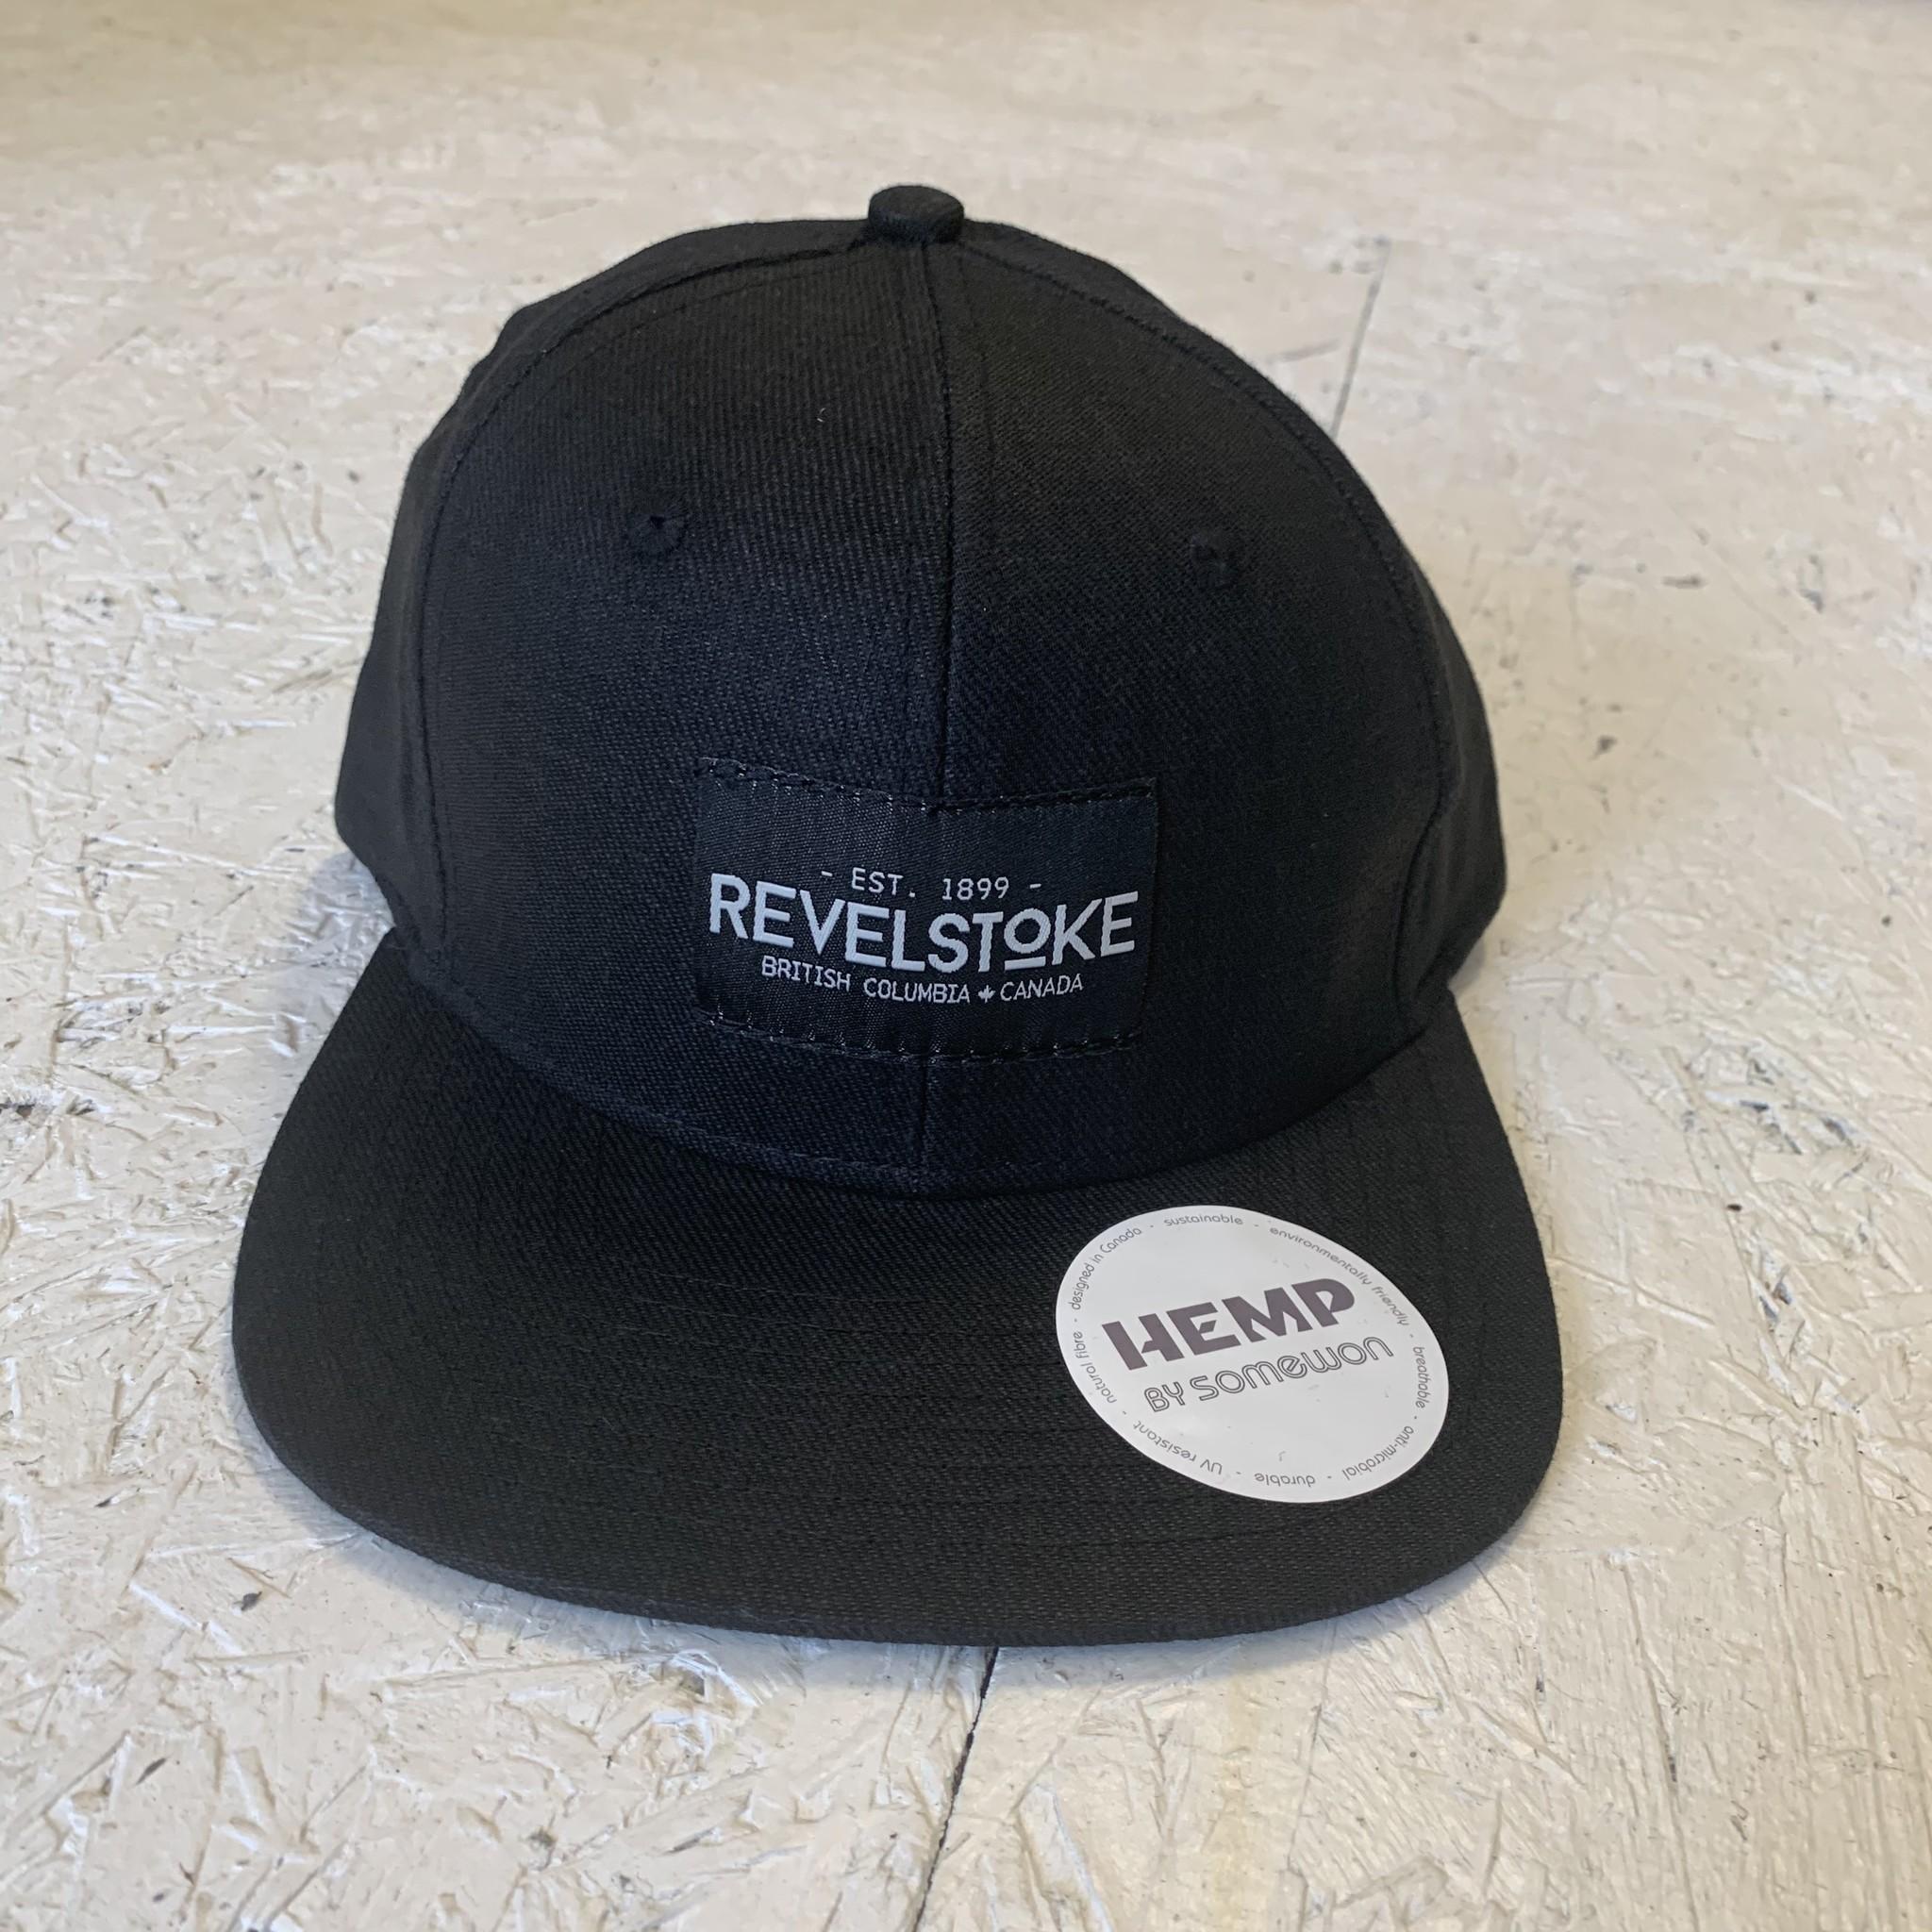 Revelstoke Trading Post Revelstoke - Trading Co Hemp Flat Brim Cap - Black